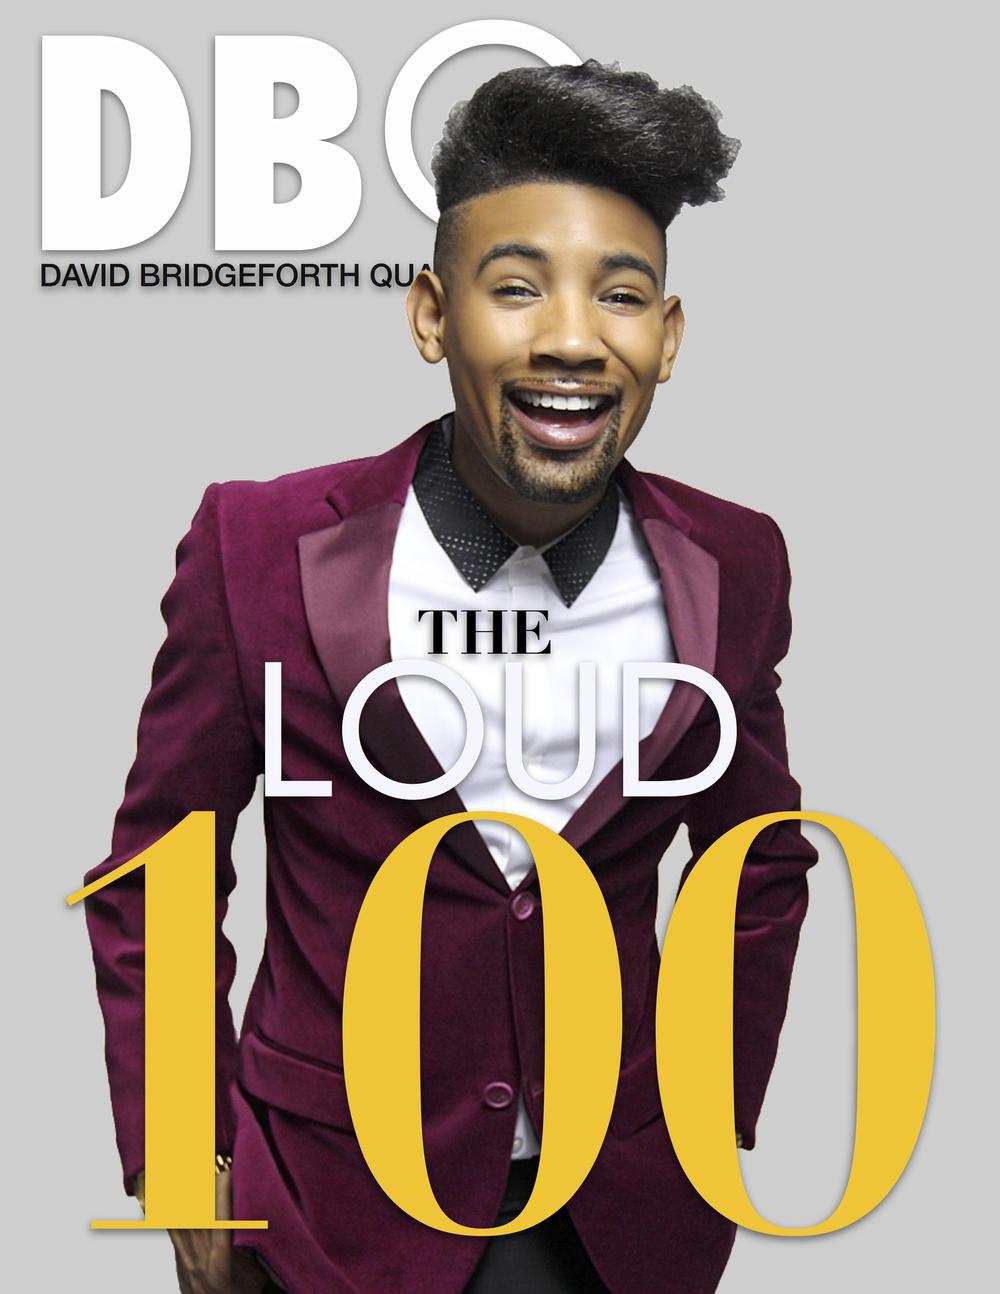 DBQ Magazine LOUD 100 COVER.jpg